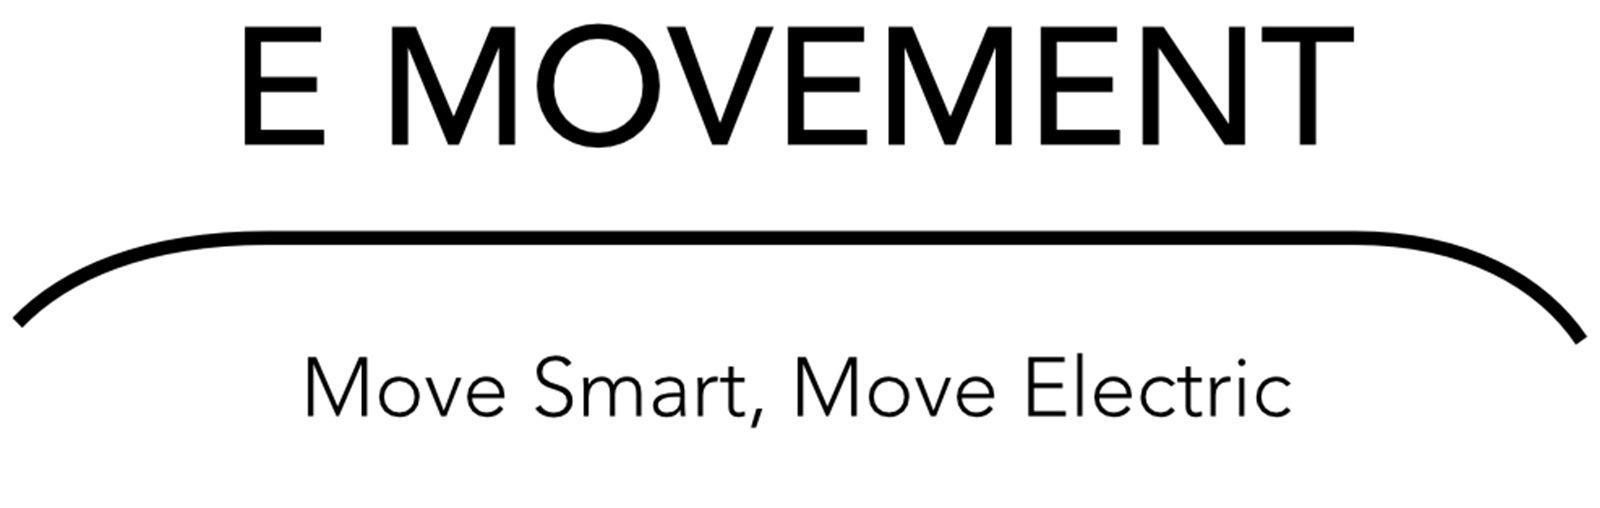 E Movement